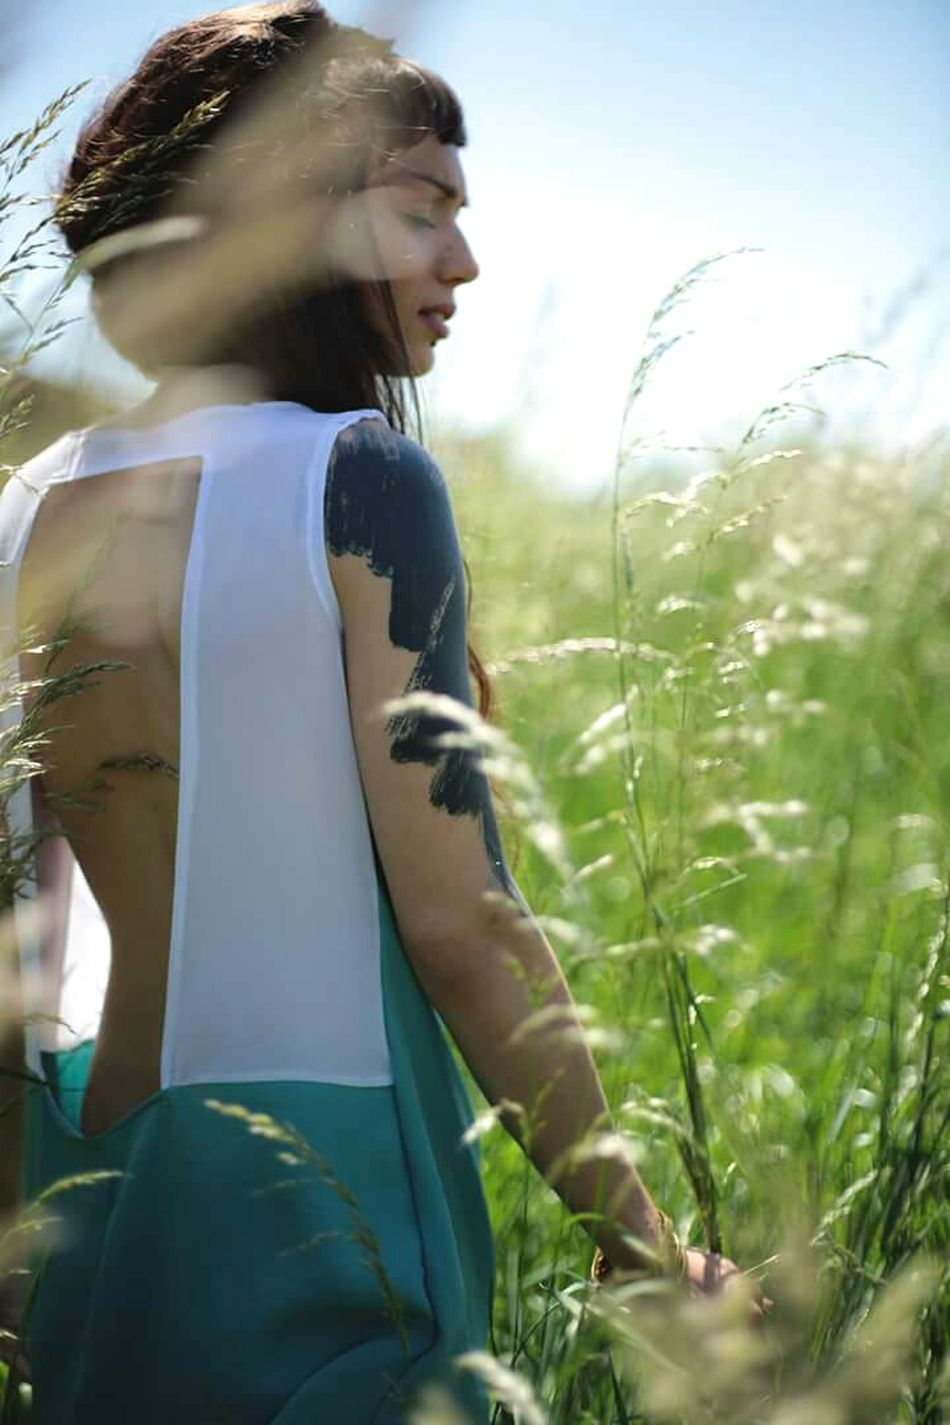 🌴♬❤ Summer Day Nature Grassfield Fashionable Fashionblogger Fashionphotography Tattooedgirls Tattoo Girl Tattooart Blacktattoo Photoshoot Photos Around You Canon_photos Fashionbrand Candybalism First Eyeem Photo